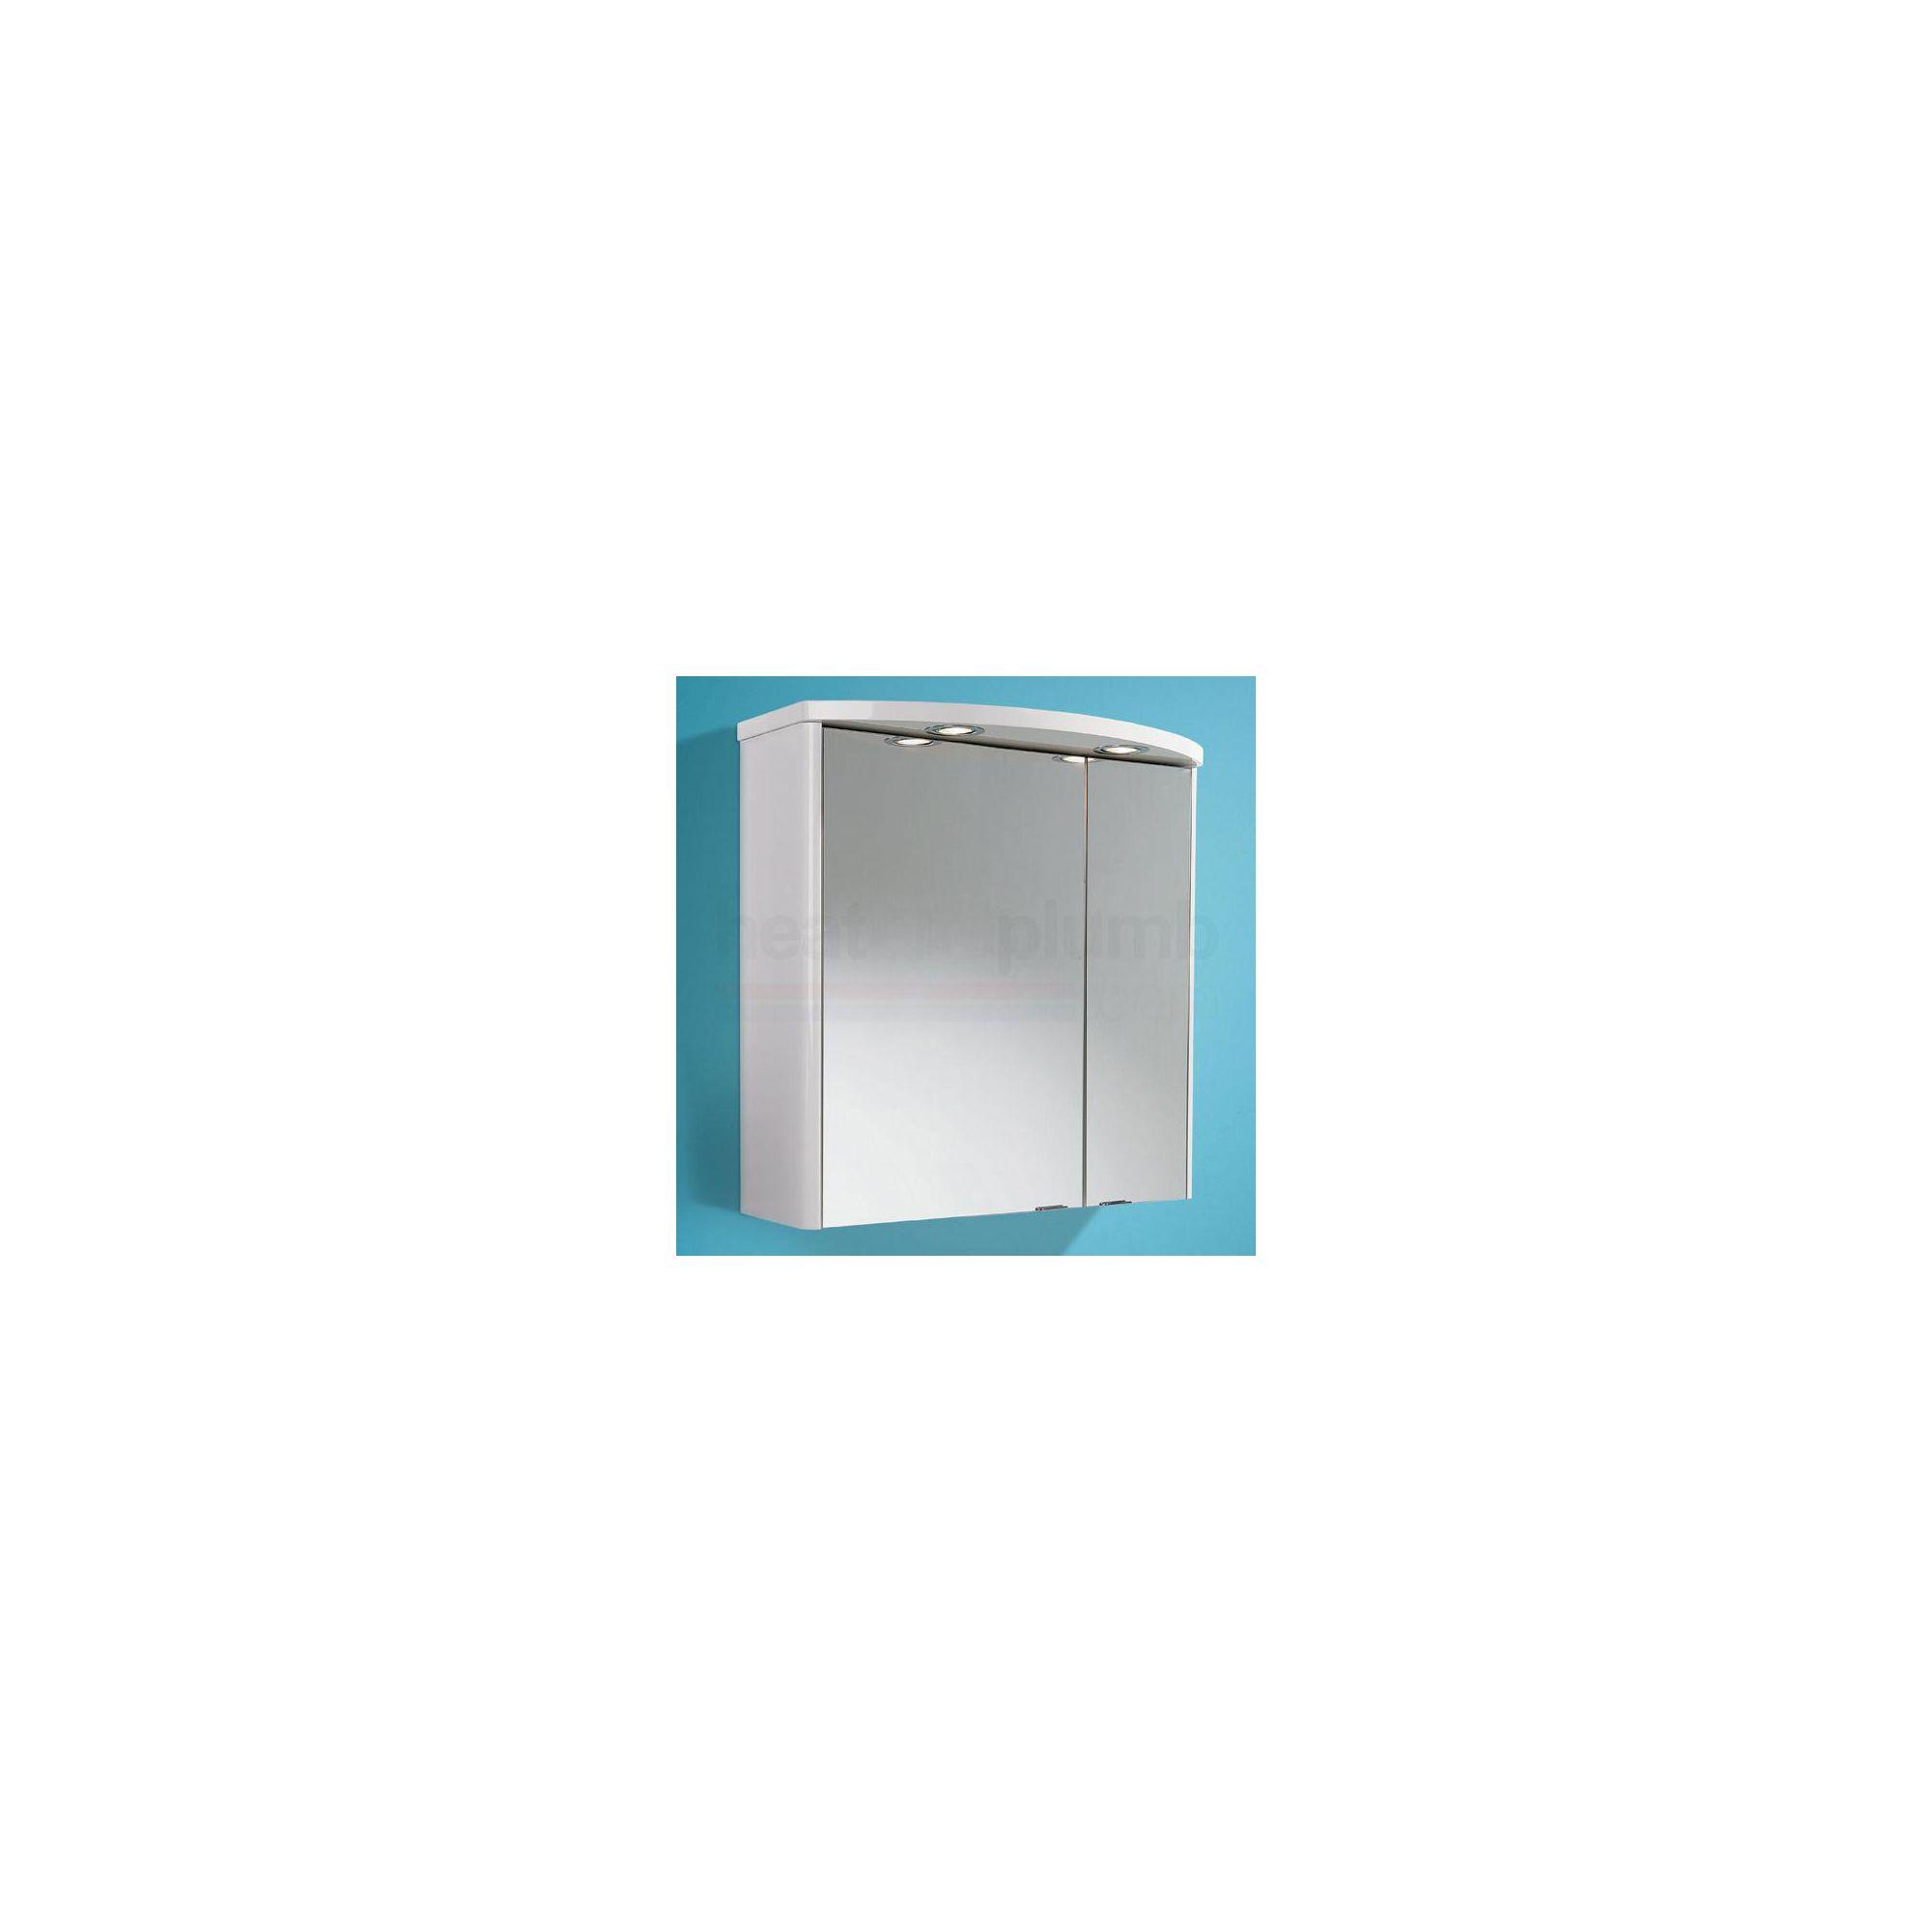 HiB Ambiente Illuminated Bathroom Cabinet 615mm High x 600mm Wide x 180/290mm Deep